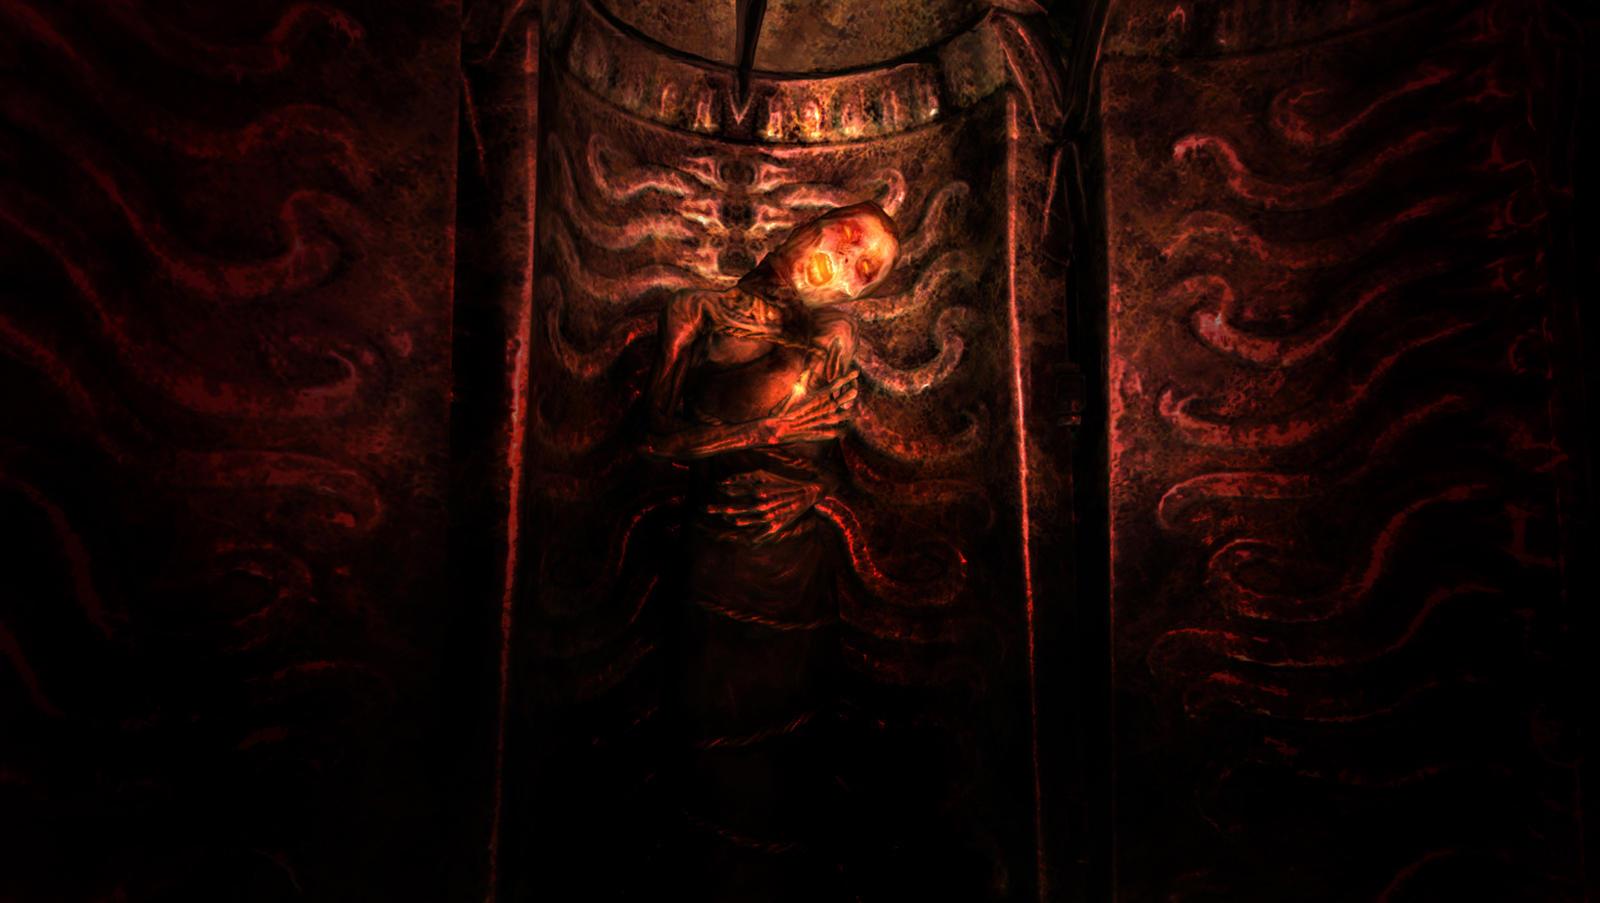 Skyrim : Night Mother by UltimaDX on DeviantArt